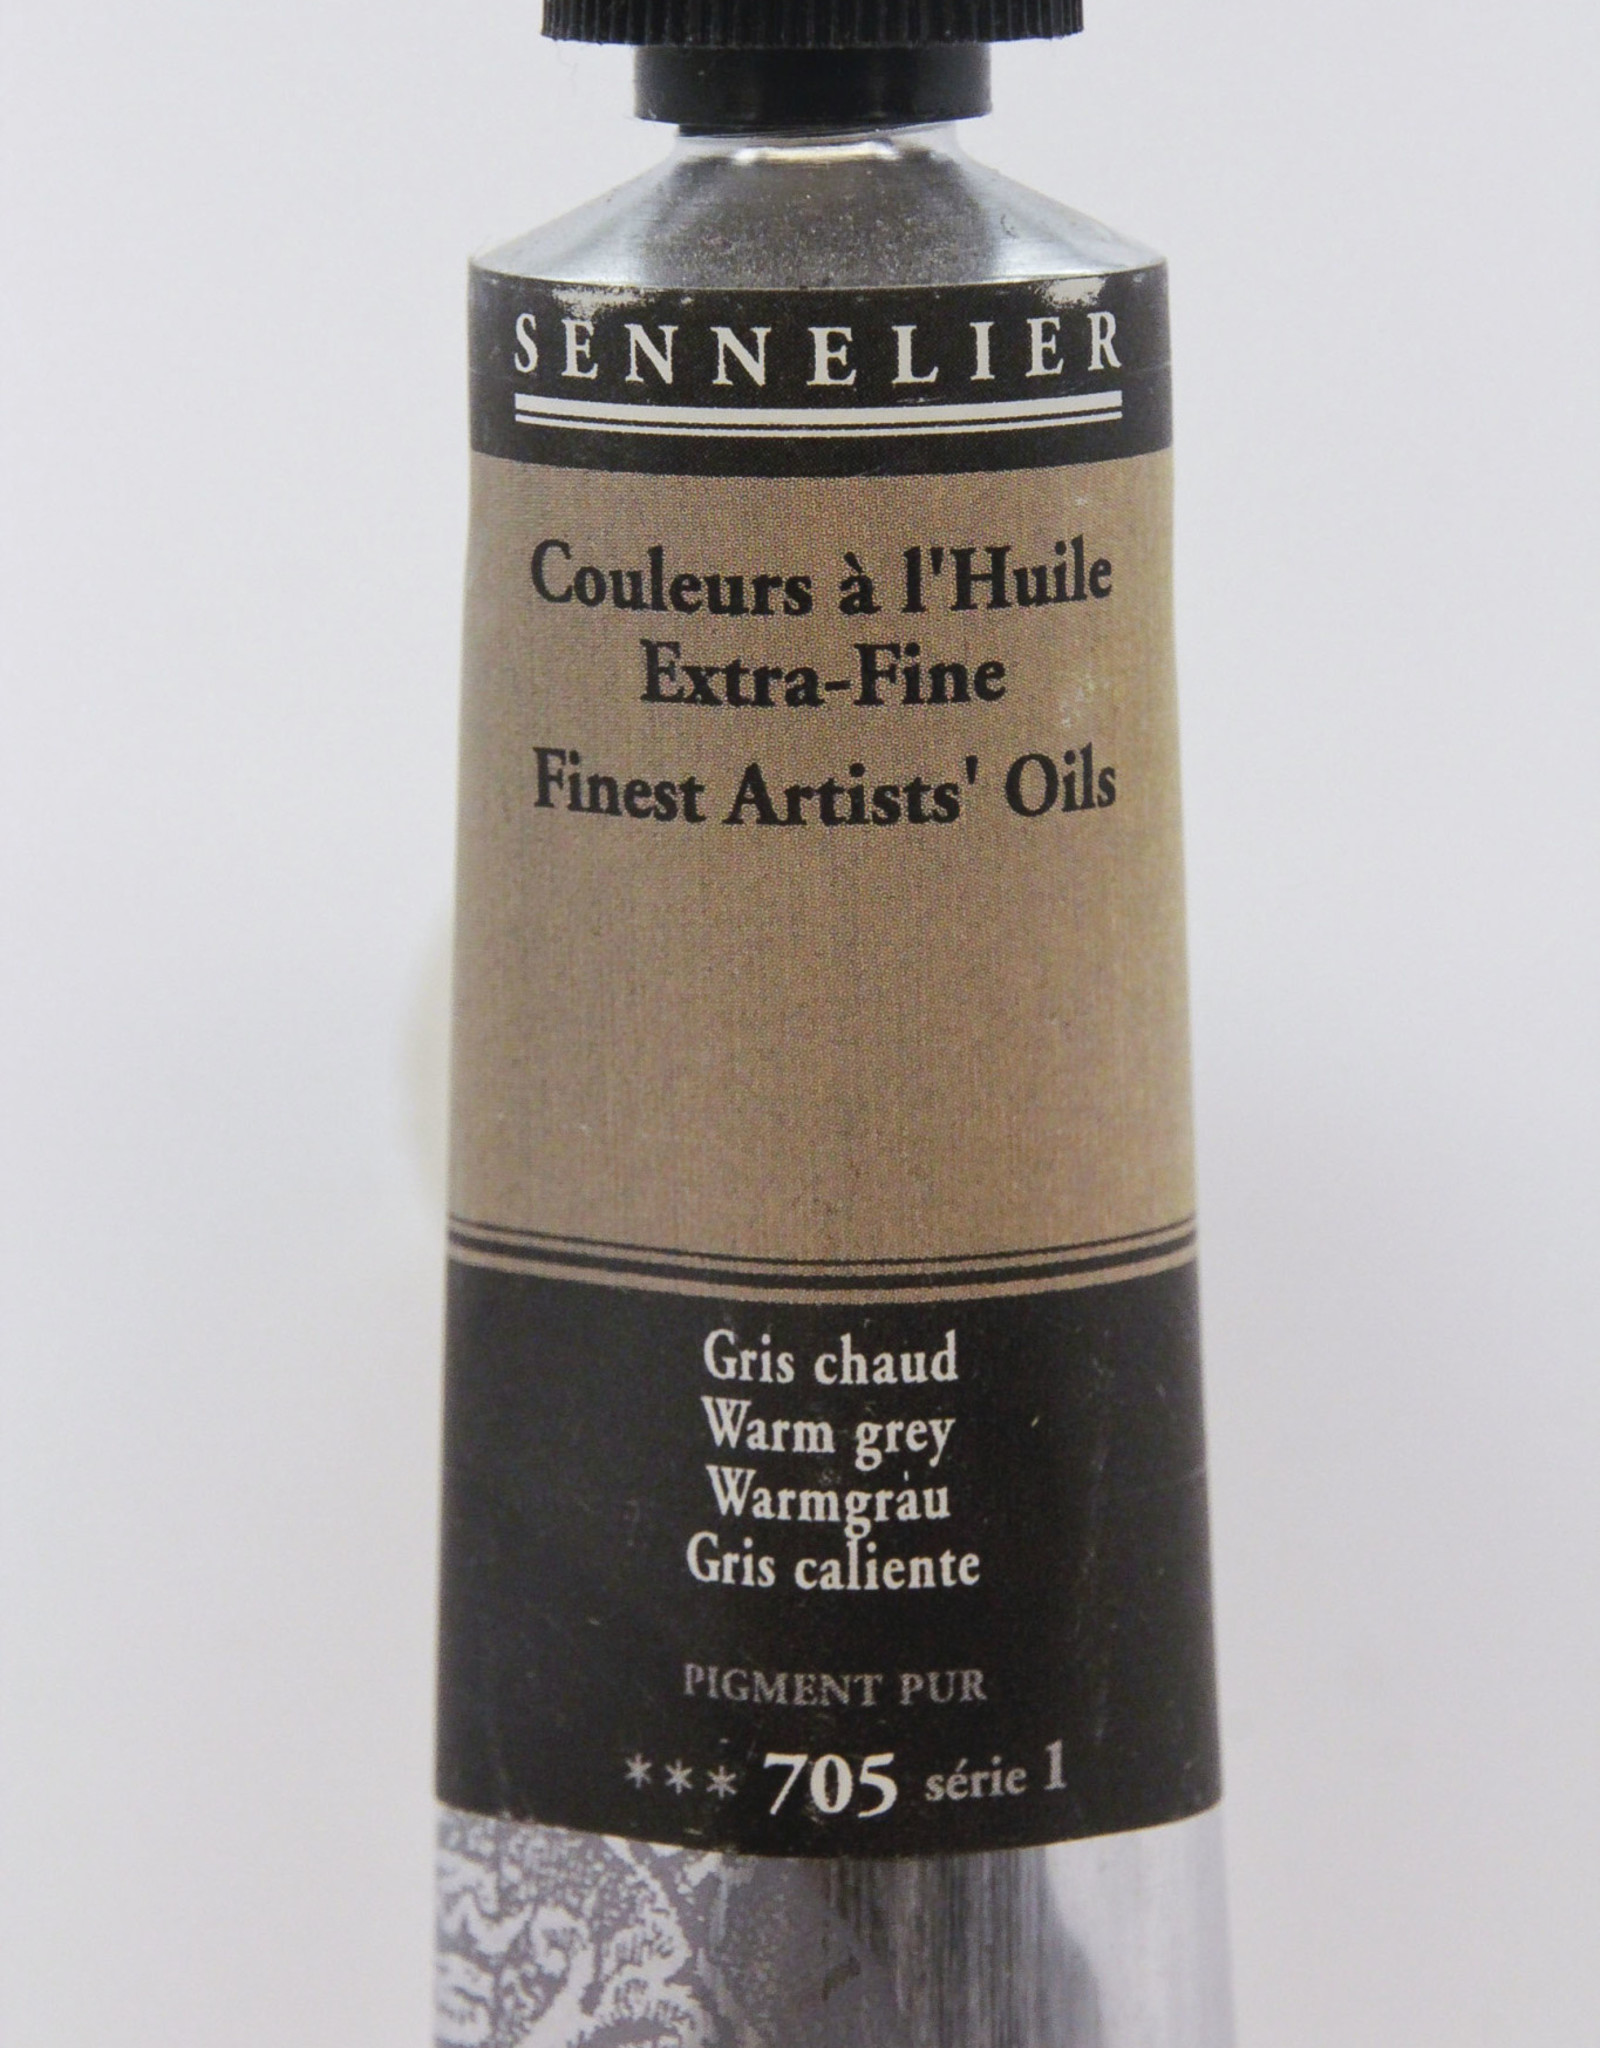 Sennelier, Fine Artists' Oil Paint, Warm Grey, 705, 40ml Tube, Series 1